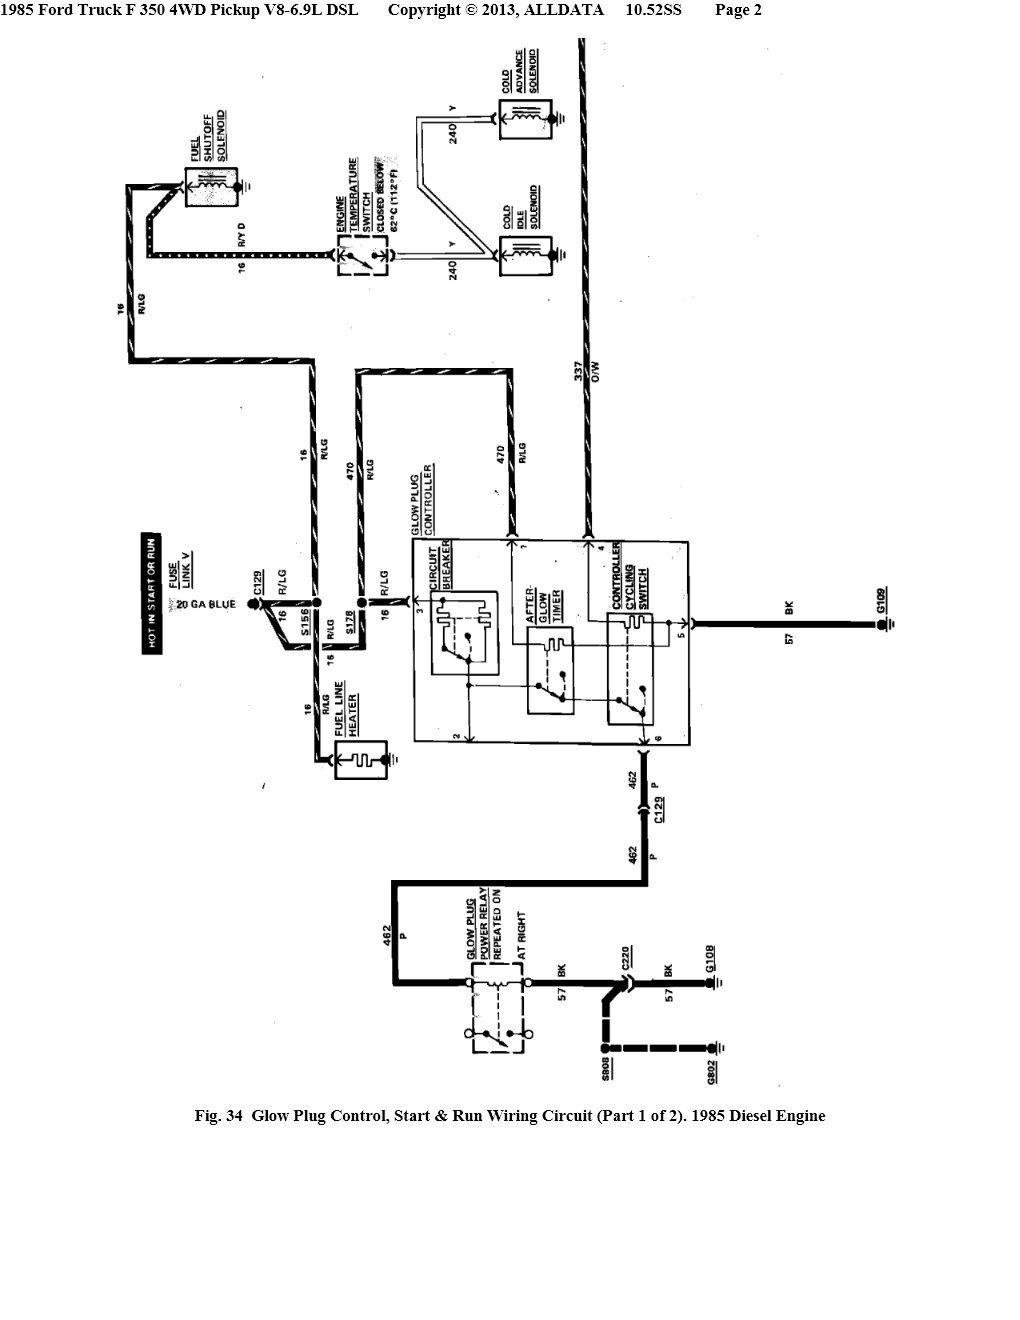 80 7_2_8b9f87b58dfb671f50fdfa0fbf8d91f2c92bb79e 89 chevy truck wiring diagram roslonek net,1990 Chevy 1500 Tail Light Wiring Diagram